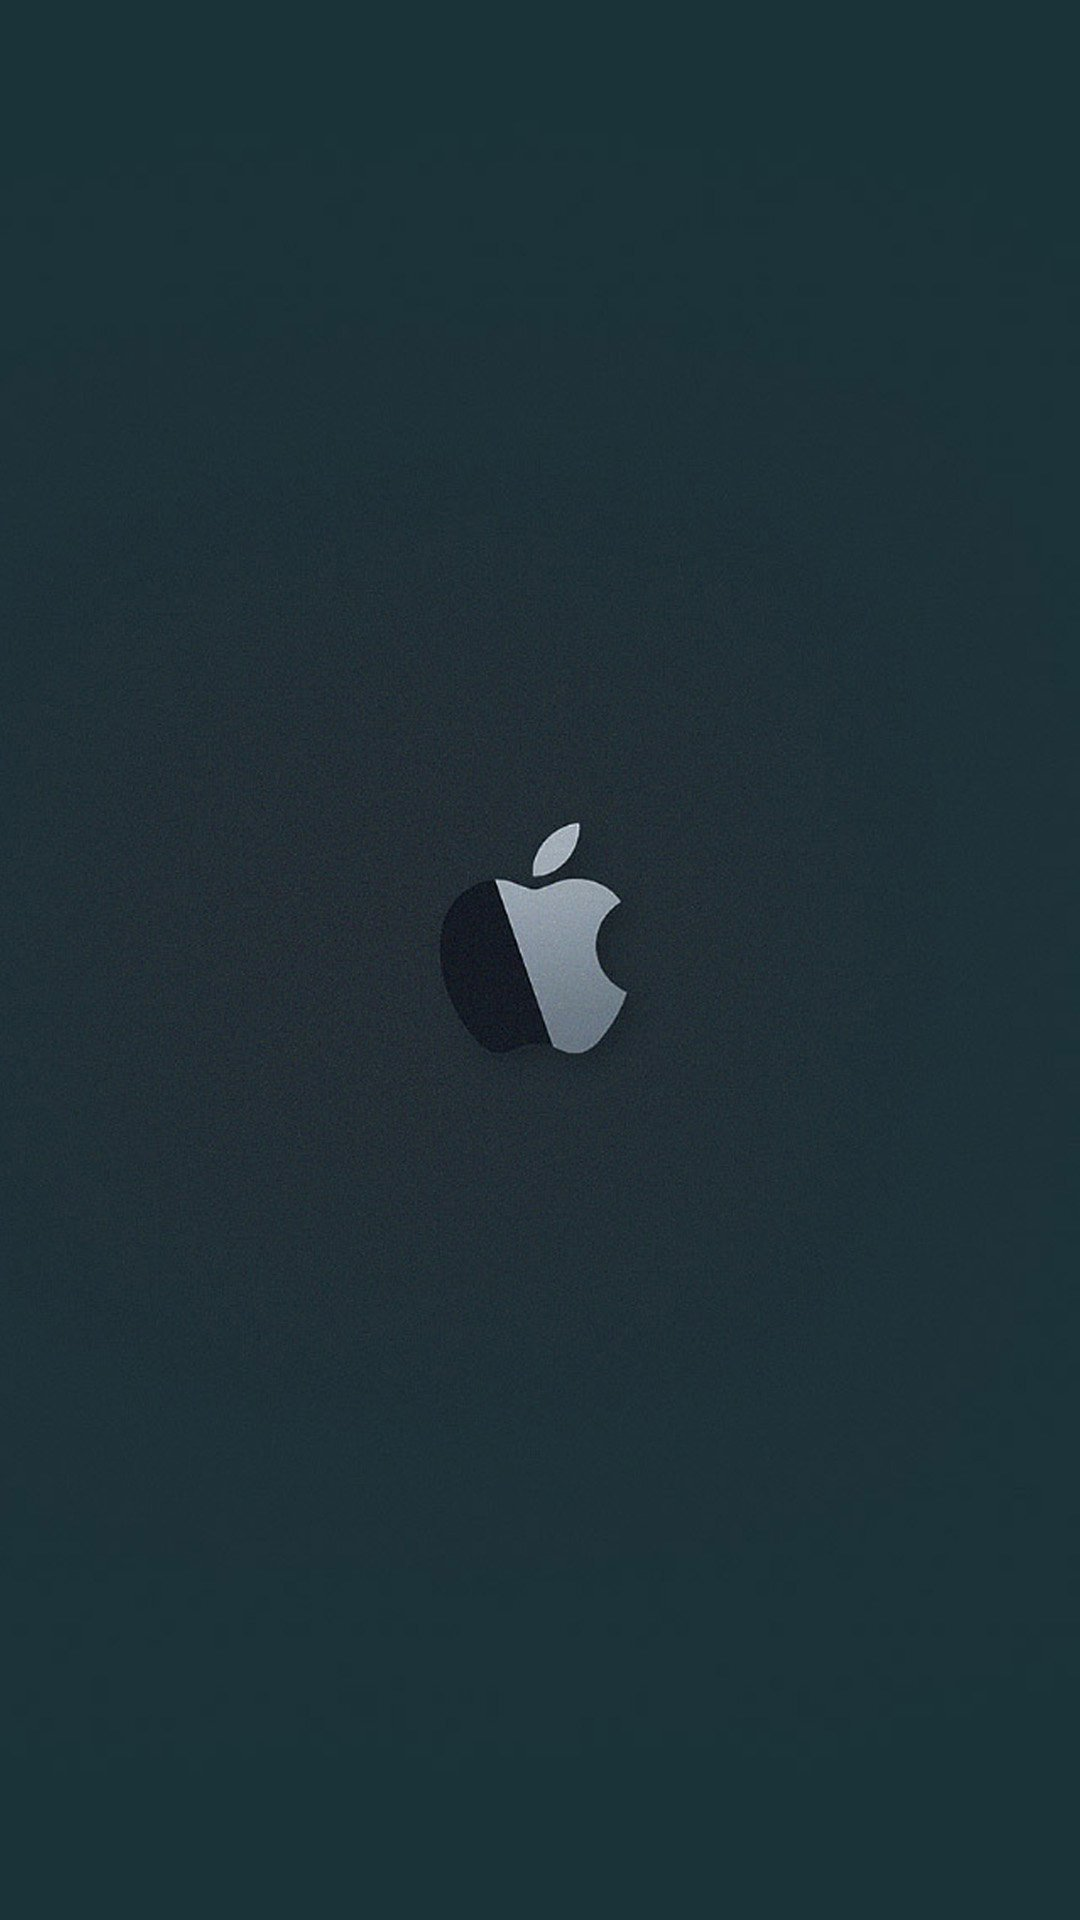 Apple Shiny Black Rear HD Wallpaper iPhone 6 plus wallpapersmobile 1080x1920